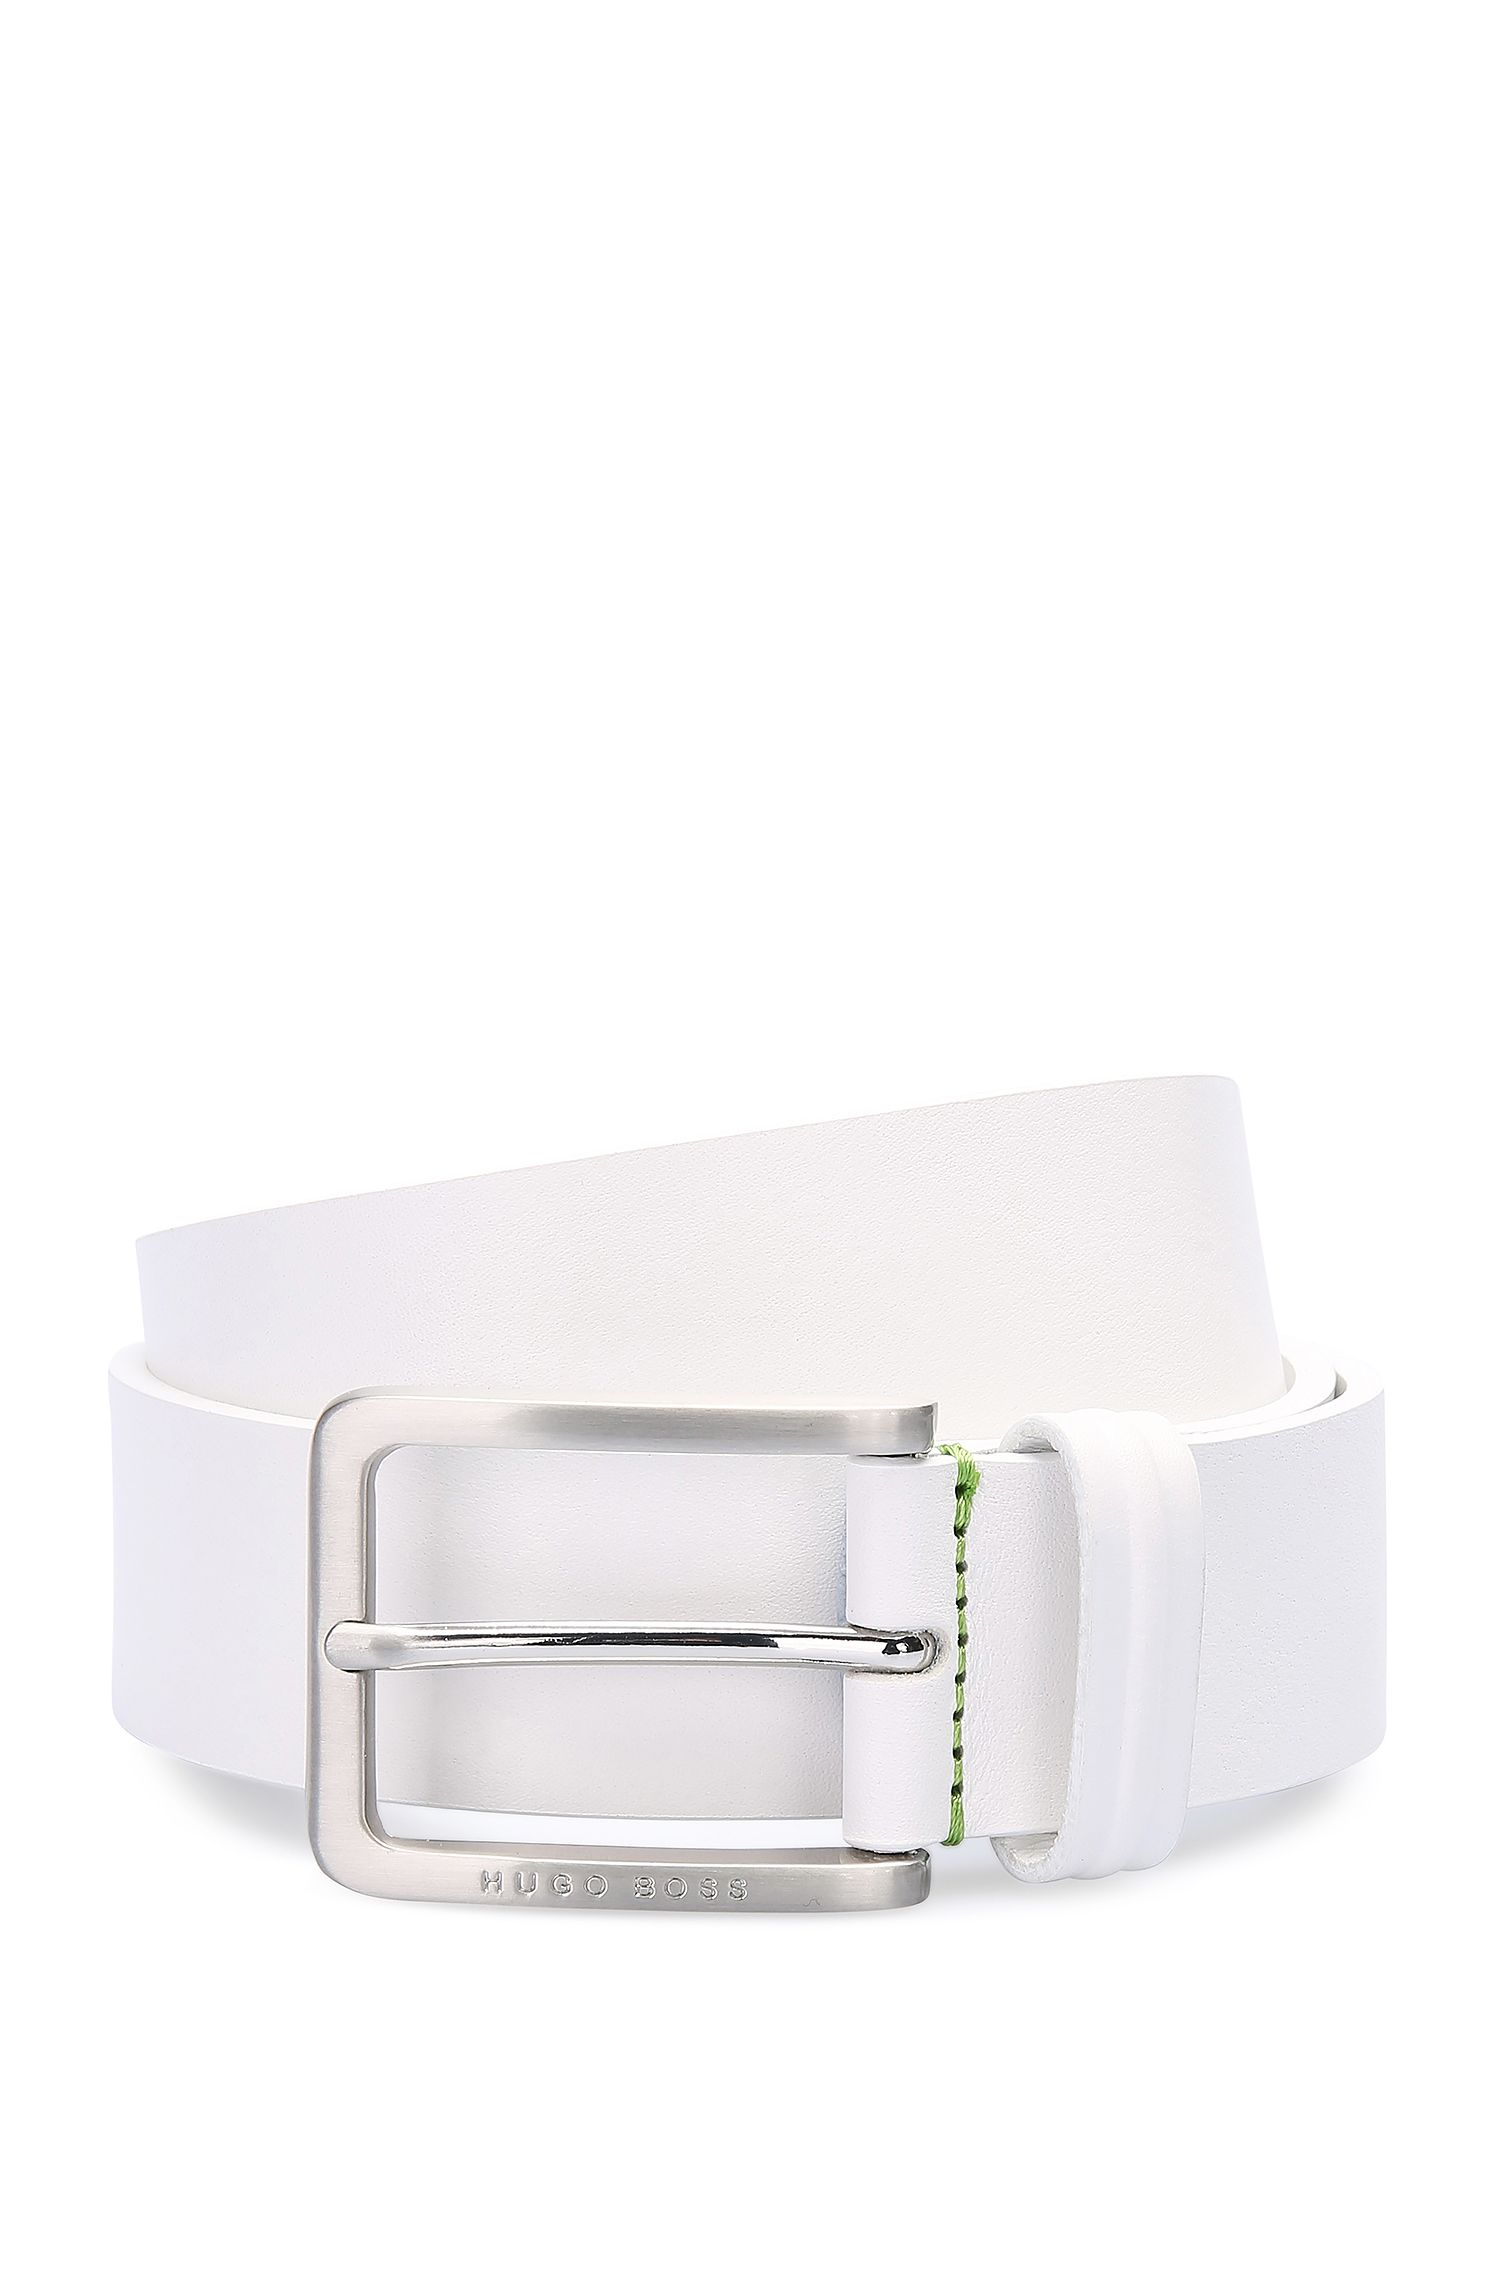 'Teseo Sz Itpl' | Leather Embossed Belt